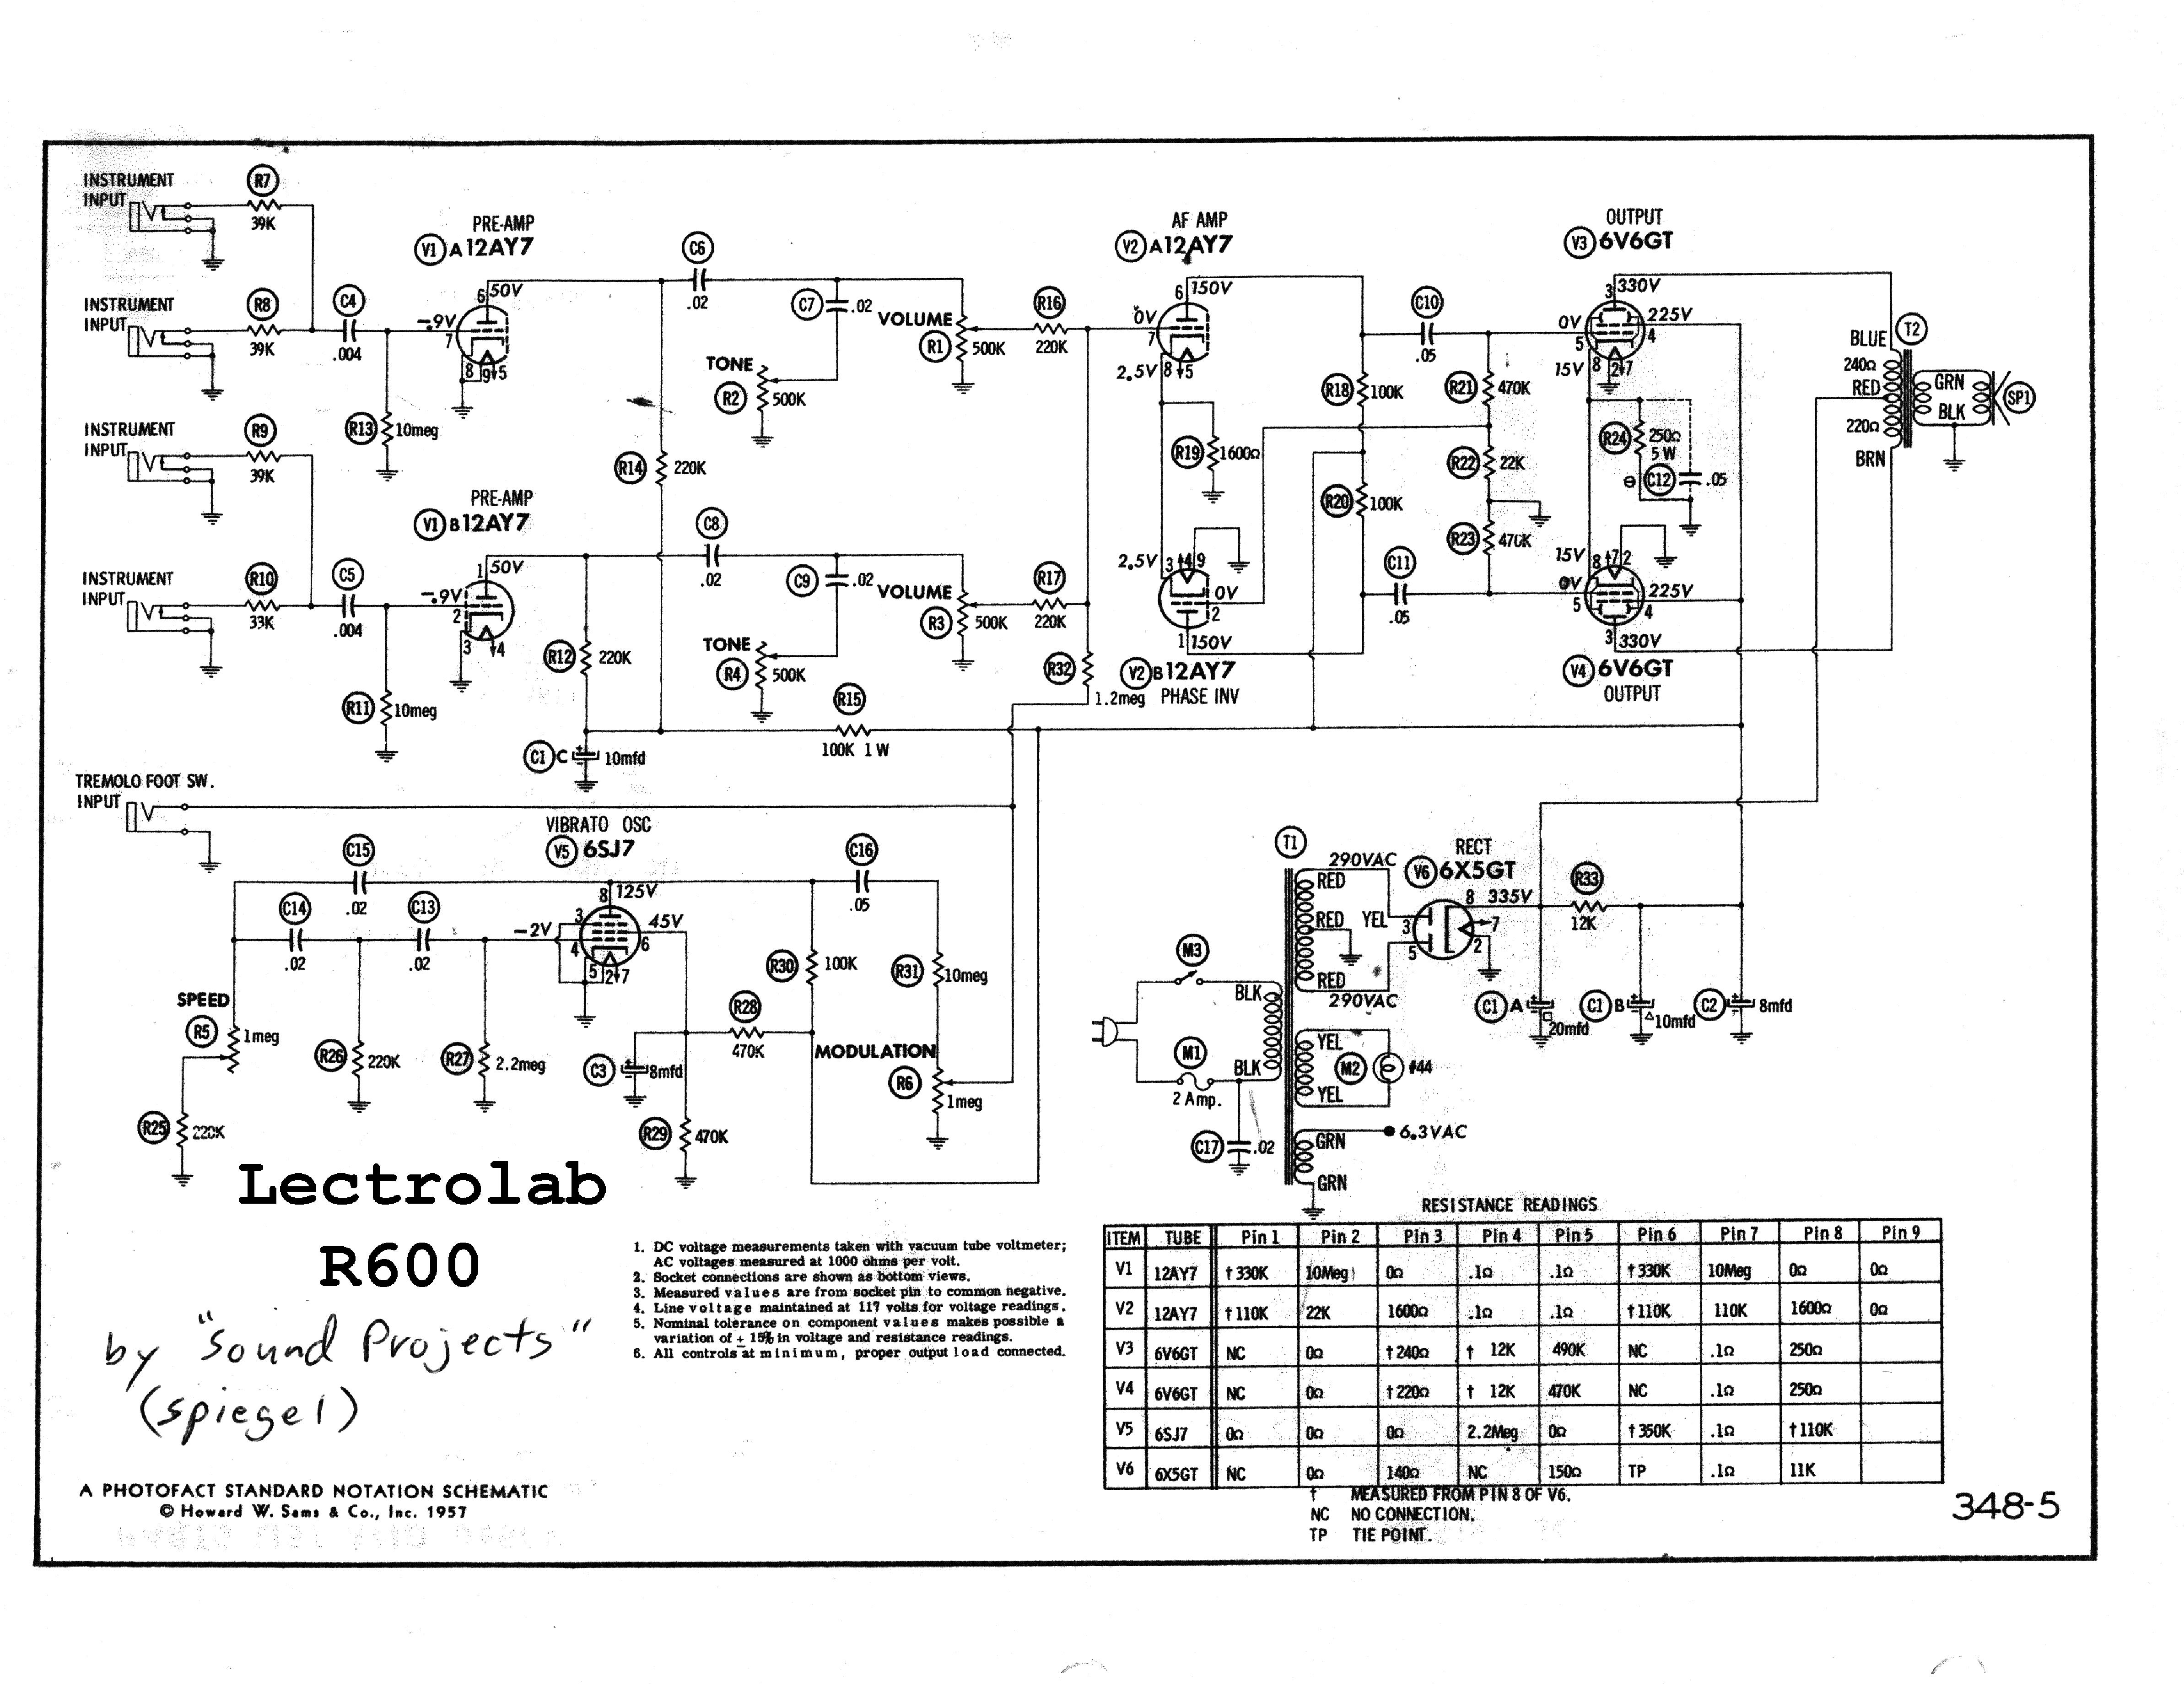 LECTROLAB R600 SCH Service Manual download, schematics, eeprom ...